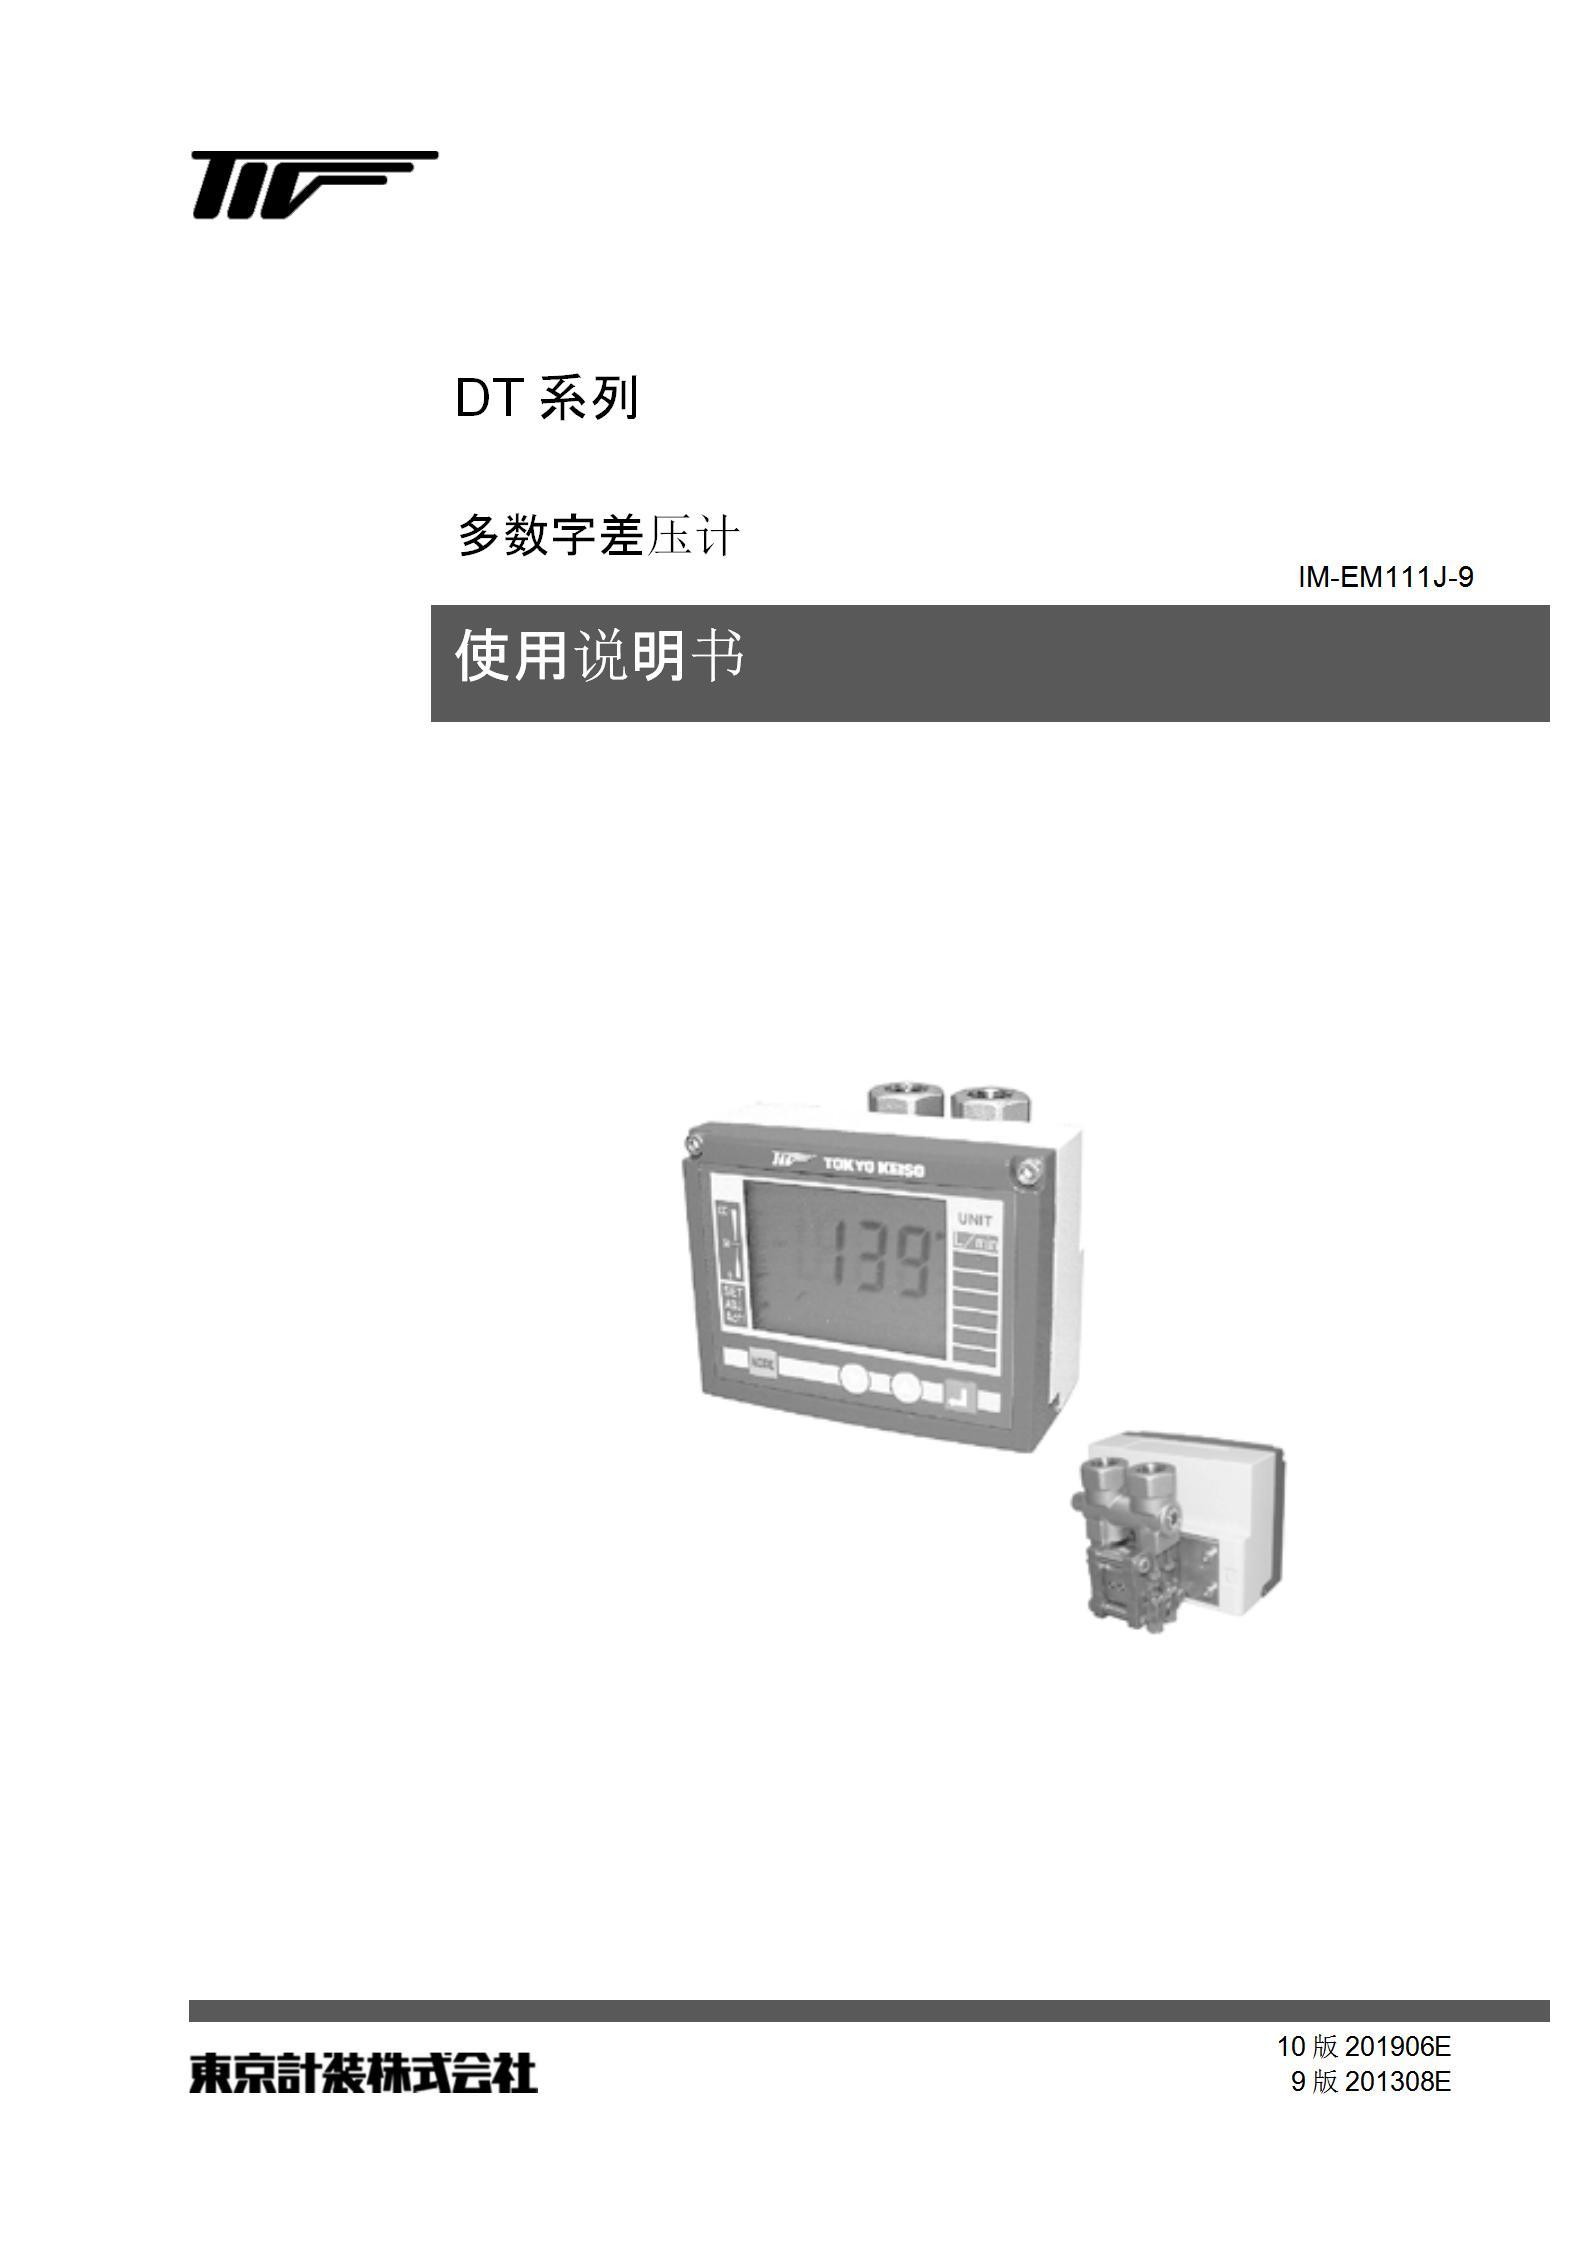 DT IM EM111J 9 decrypted 1 01 - 数字流量计使用手册翻译(日译中)